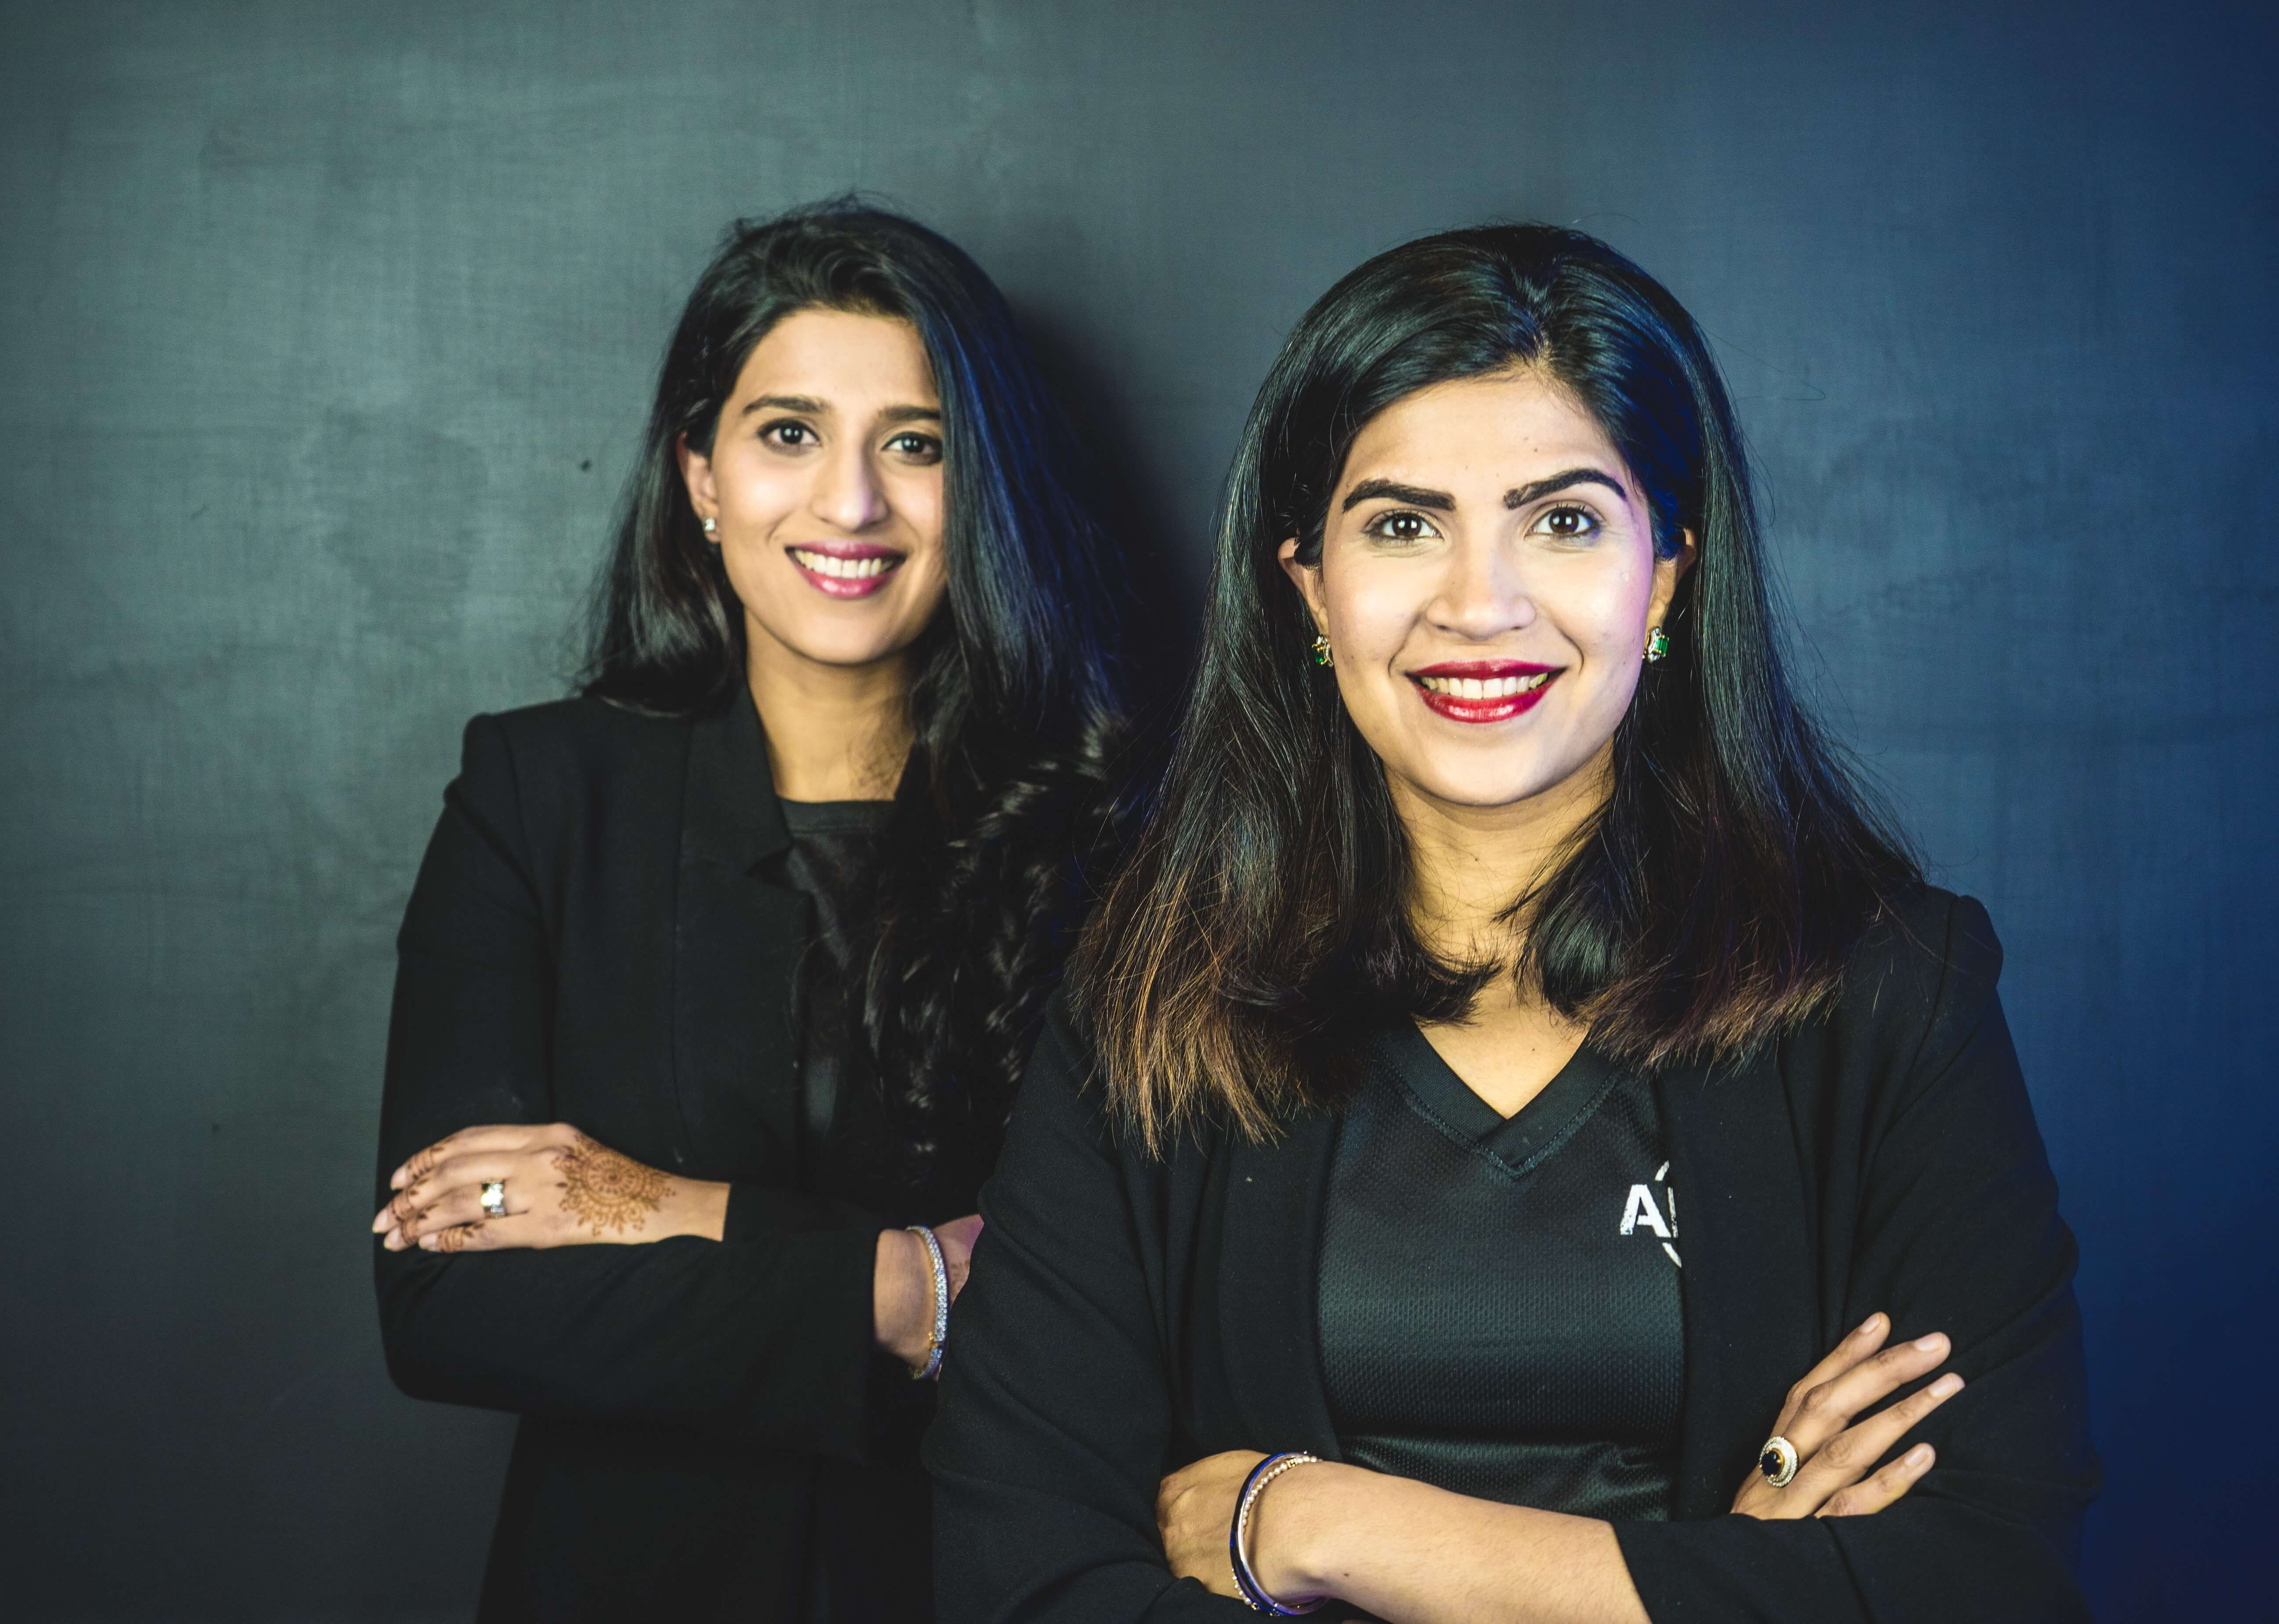 AimFit raises $1 million to scale across Pakistan